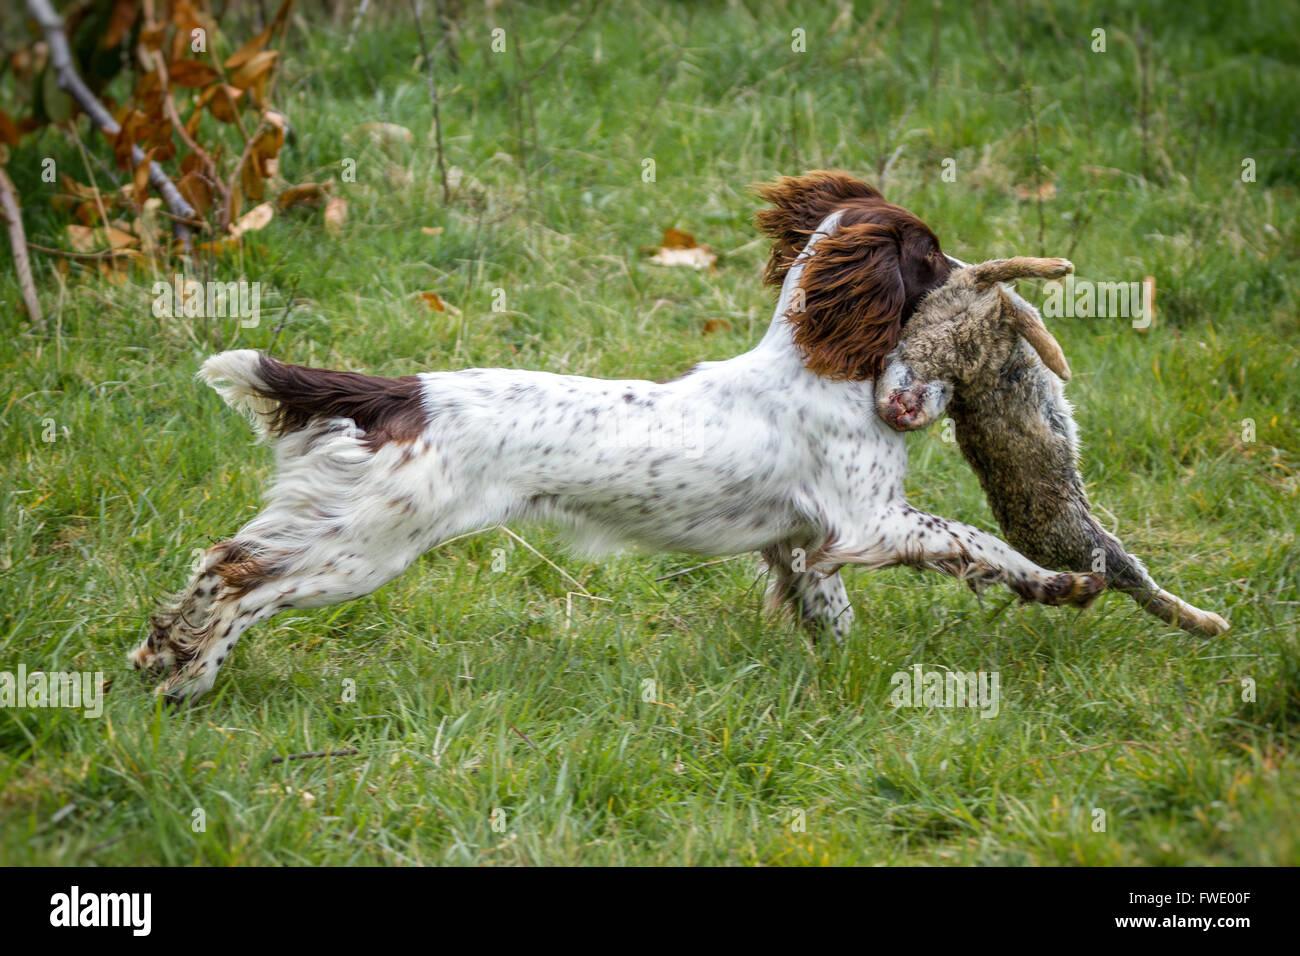 springer spaniel retrieving live rabbit game. - Stock Image